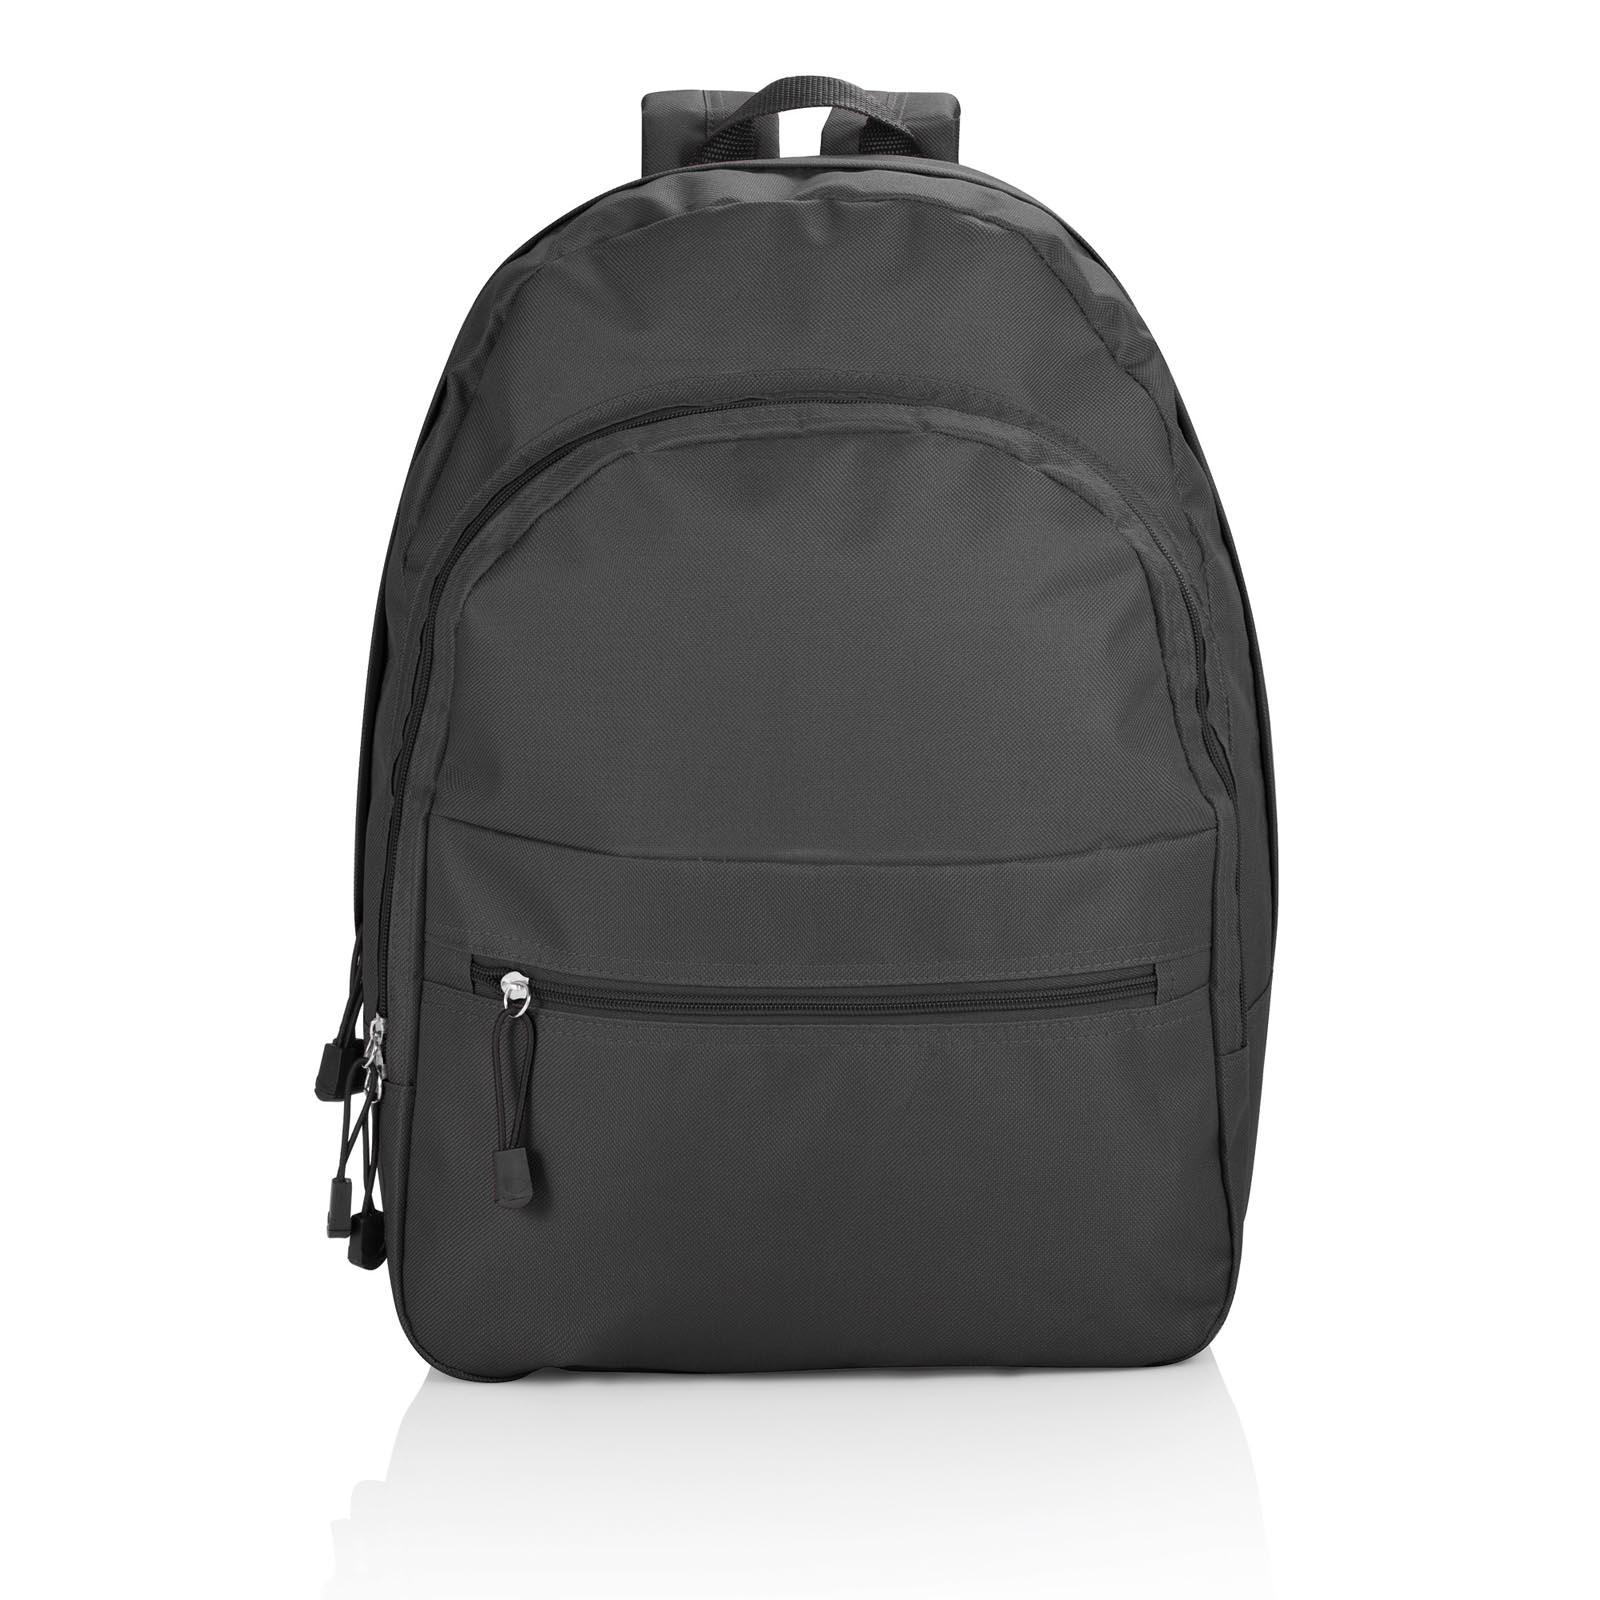 sac a dos classique personnalise bagpub kxin760201 le bagpub sacs a dos publicitaires. Black Bedroom Furniture Sets. Home Design Ideas